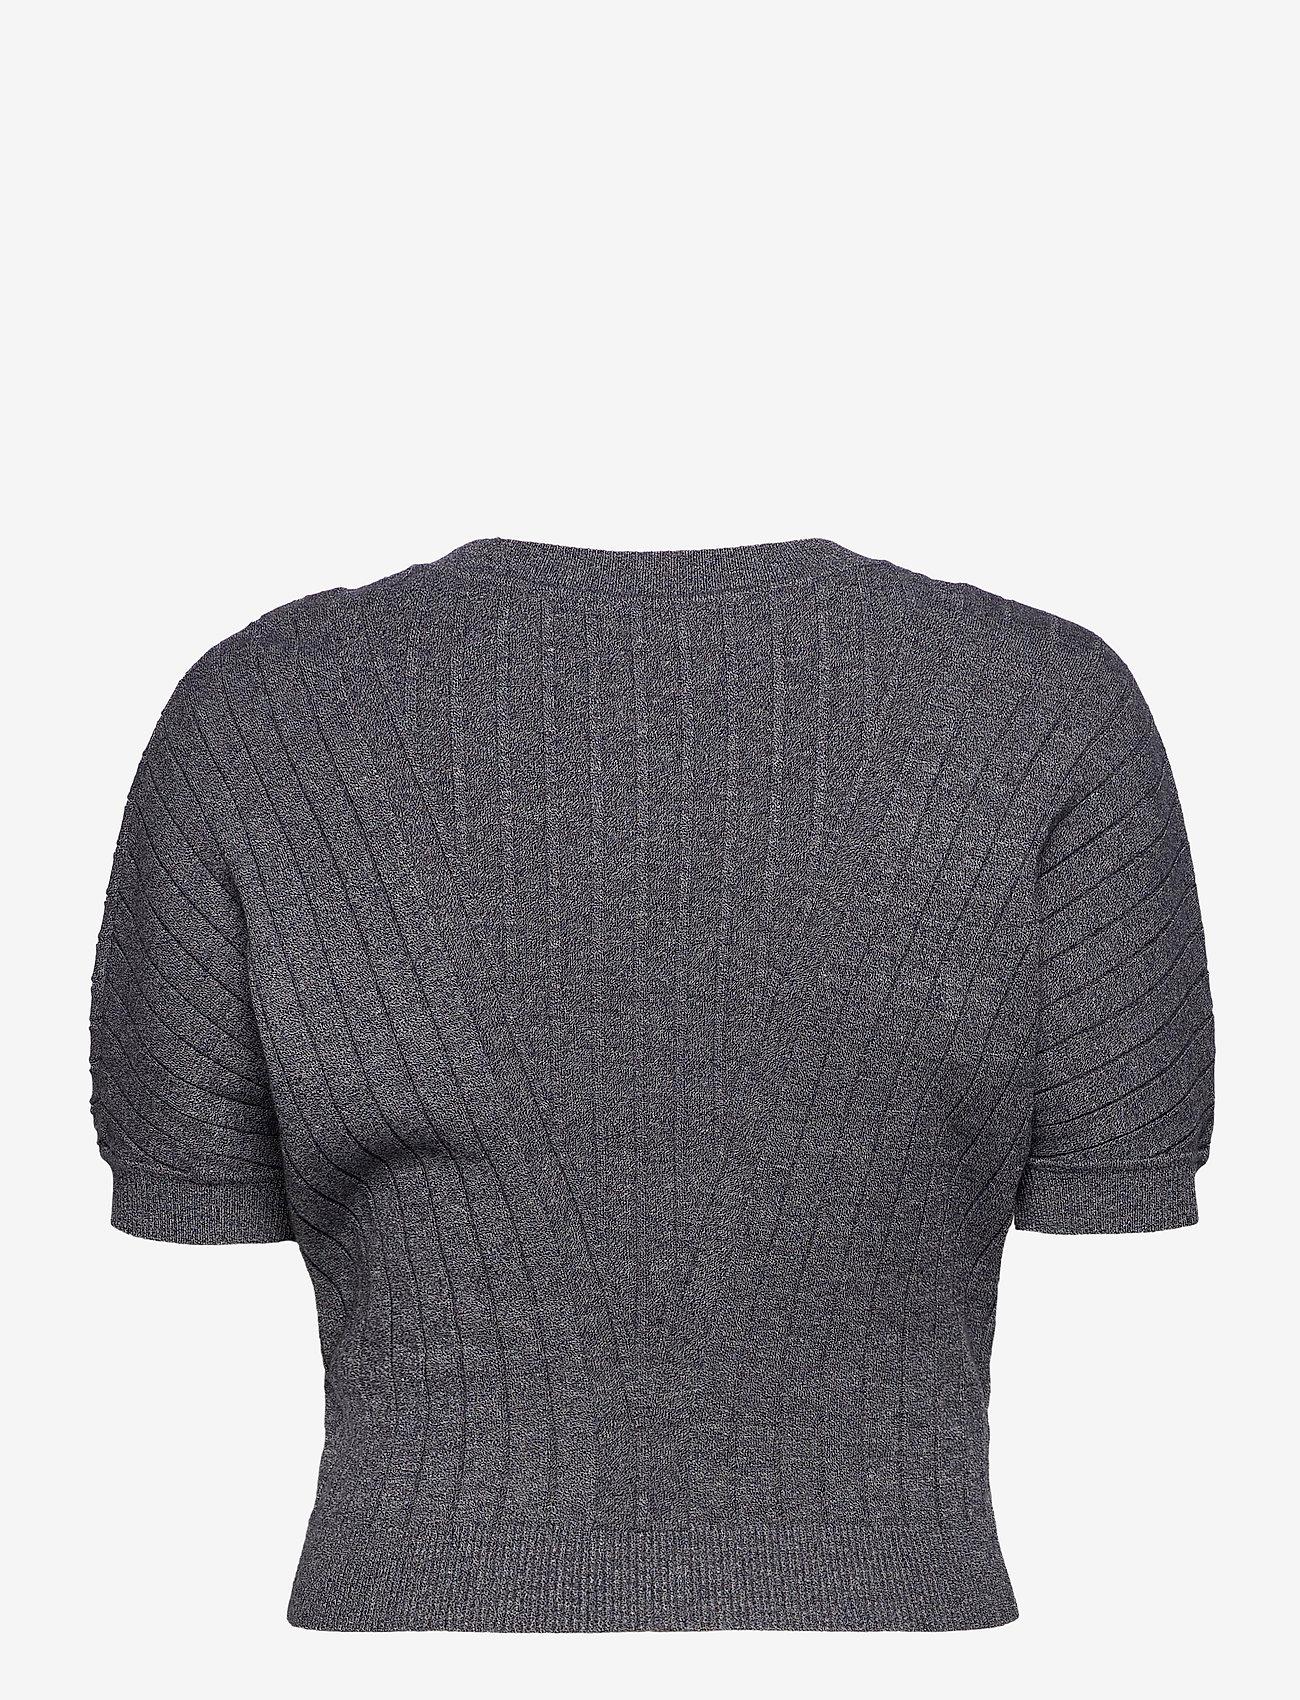 Max&Co. - DAFNE - gebreide t-shirts - navy blue pattern - 1